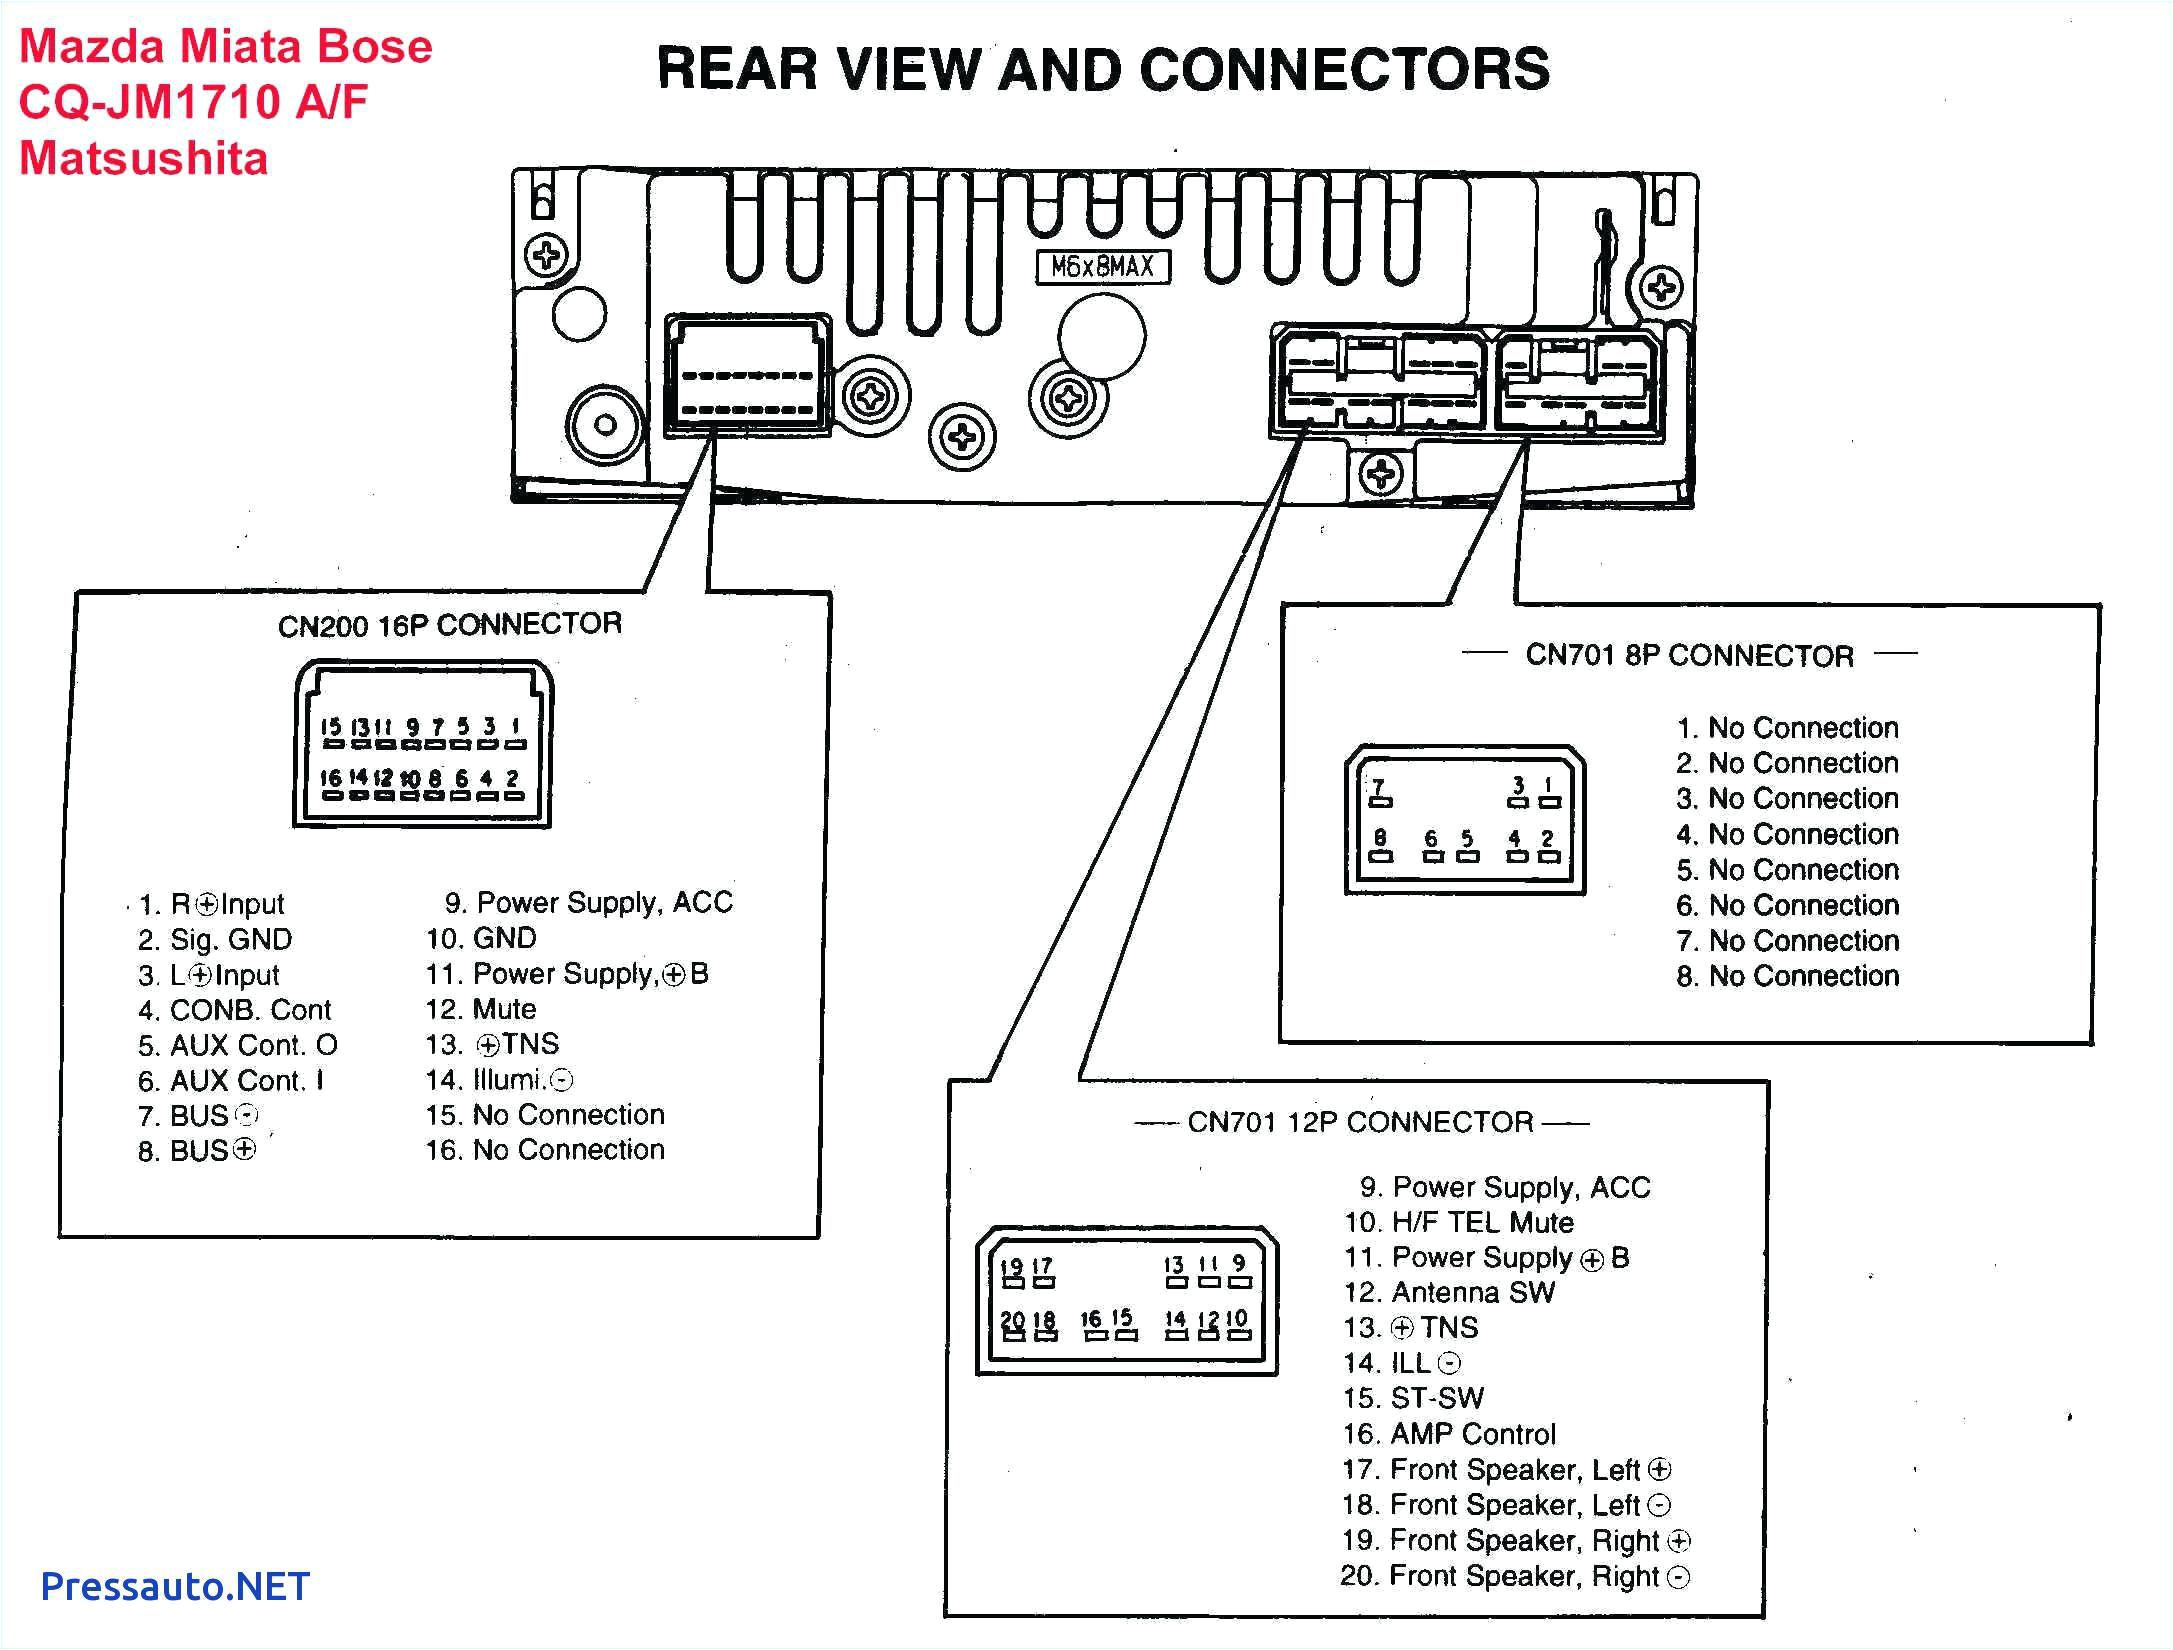 nissan radio wiring harness diagram pn 2273 wiring diagrams show nissan pulsar wiring harness diagram